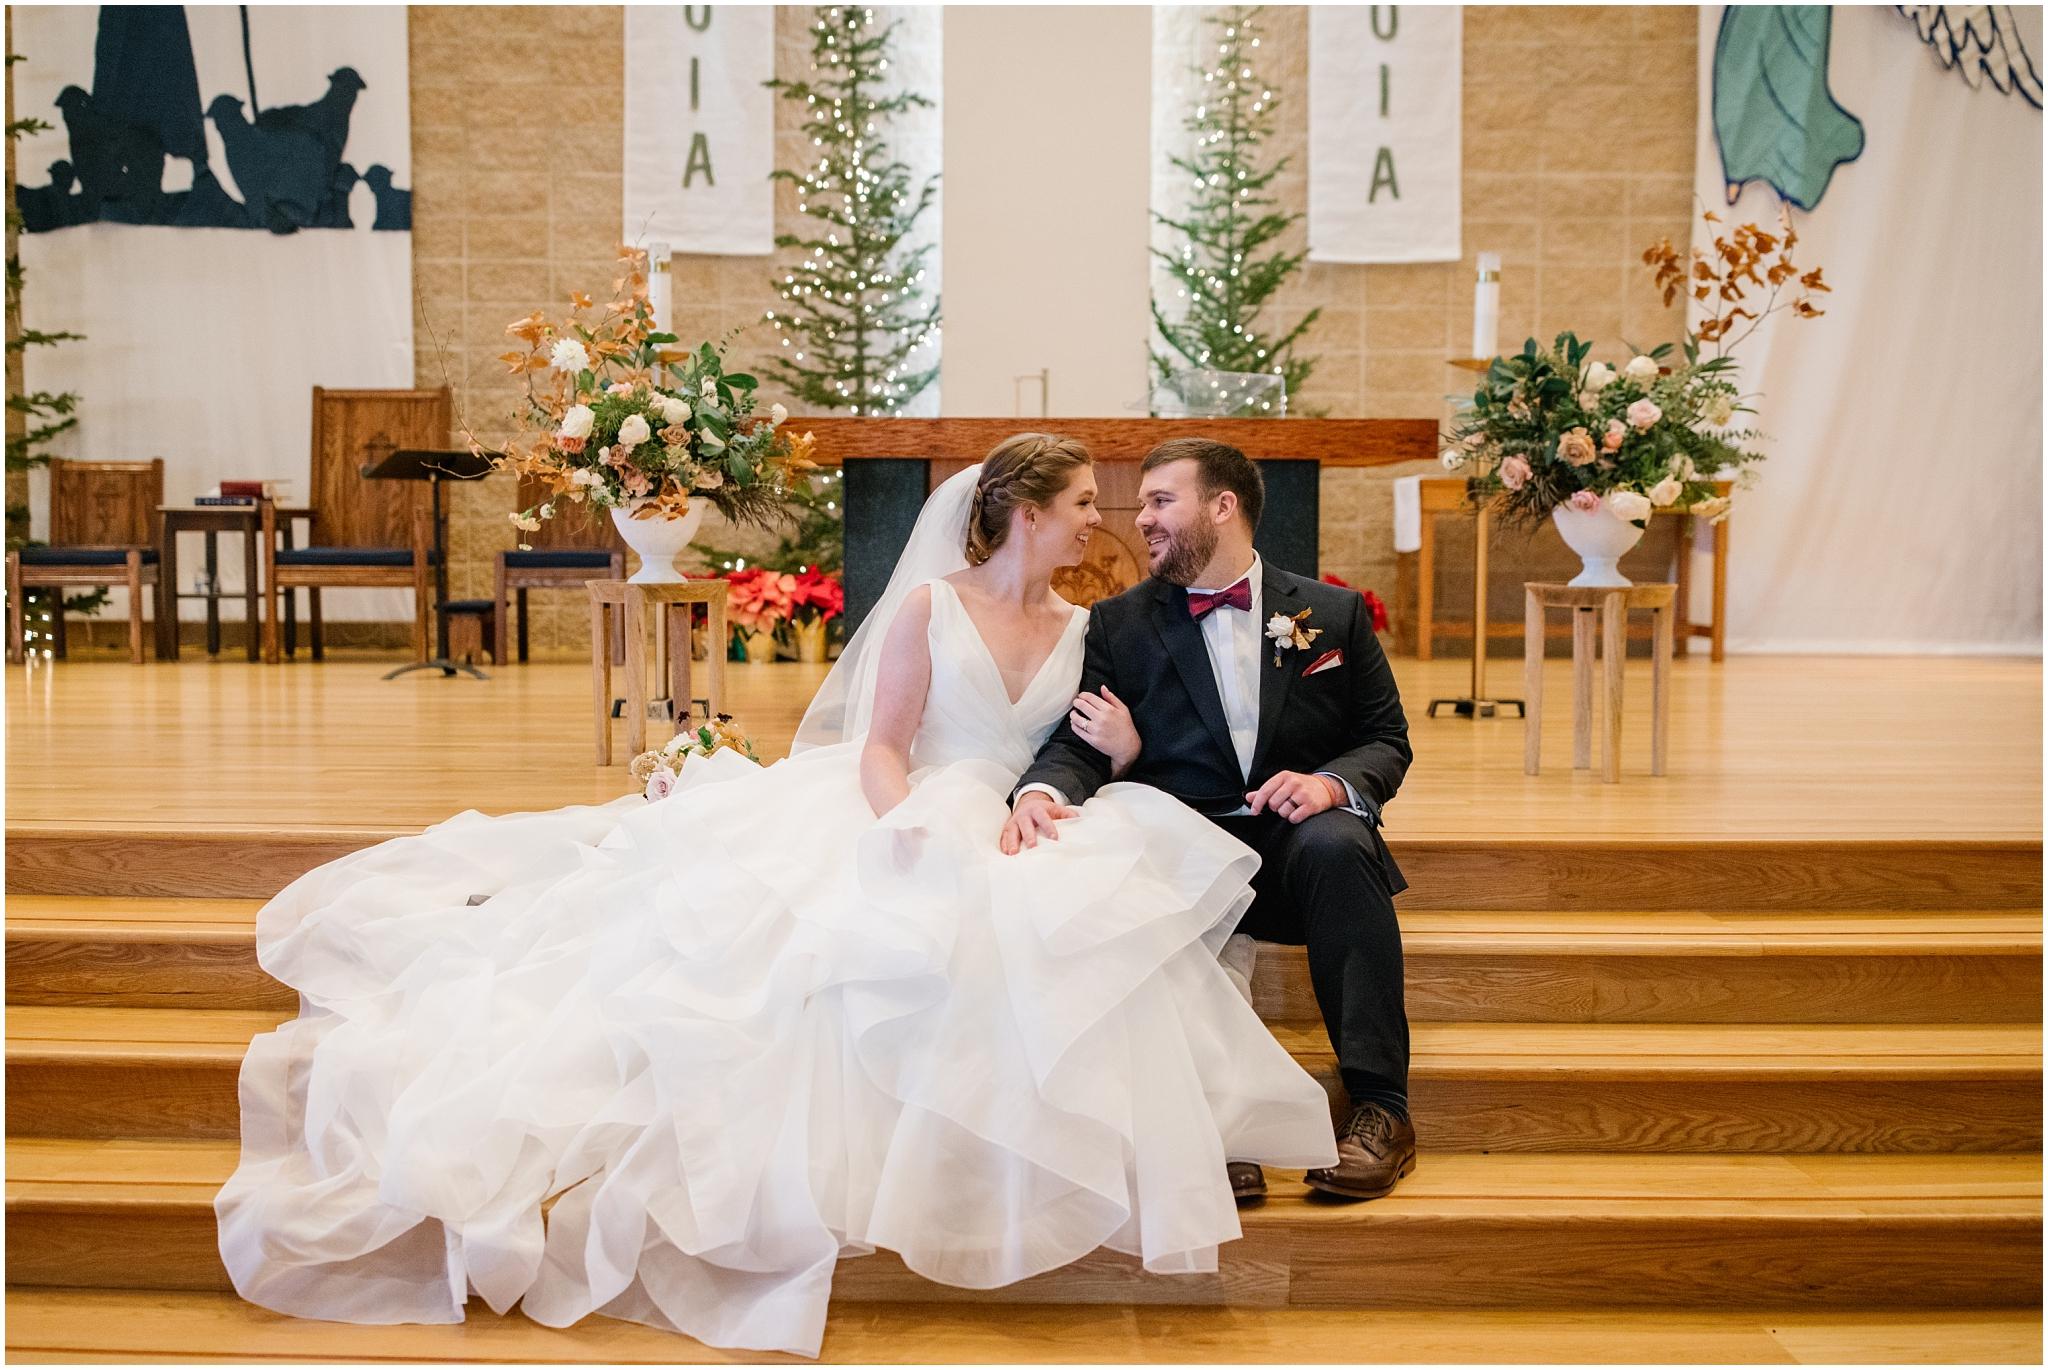 CN-Wedding-222_Lizzie-B-Imagery-Utah-Wedding-Photographer-Blessed-Sacrament-Catholic-Church-Sandy-Utah-The-Blended-Table-Salt-Lake-City.jpg